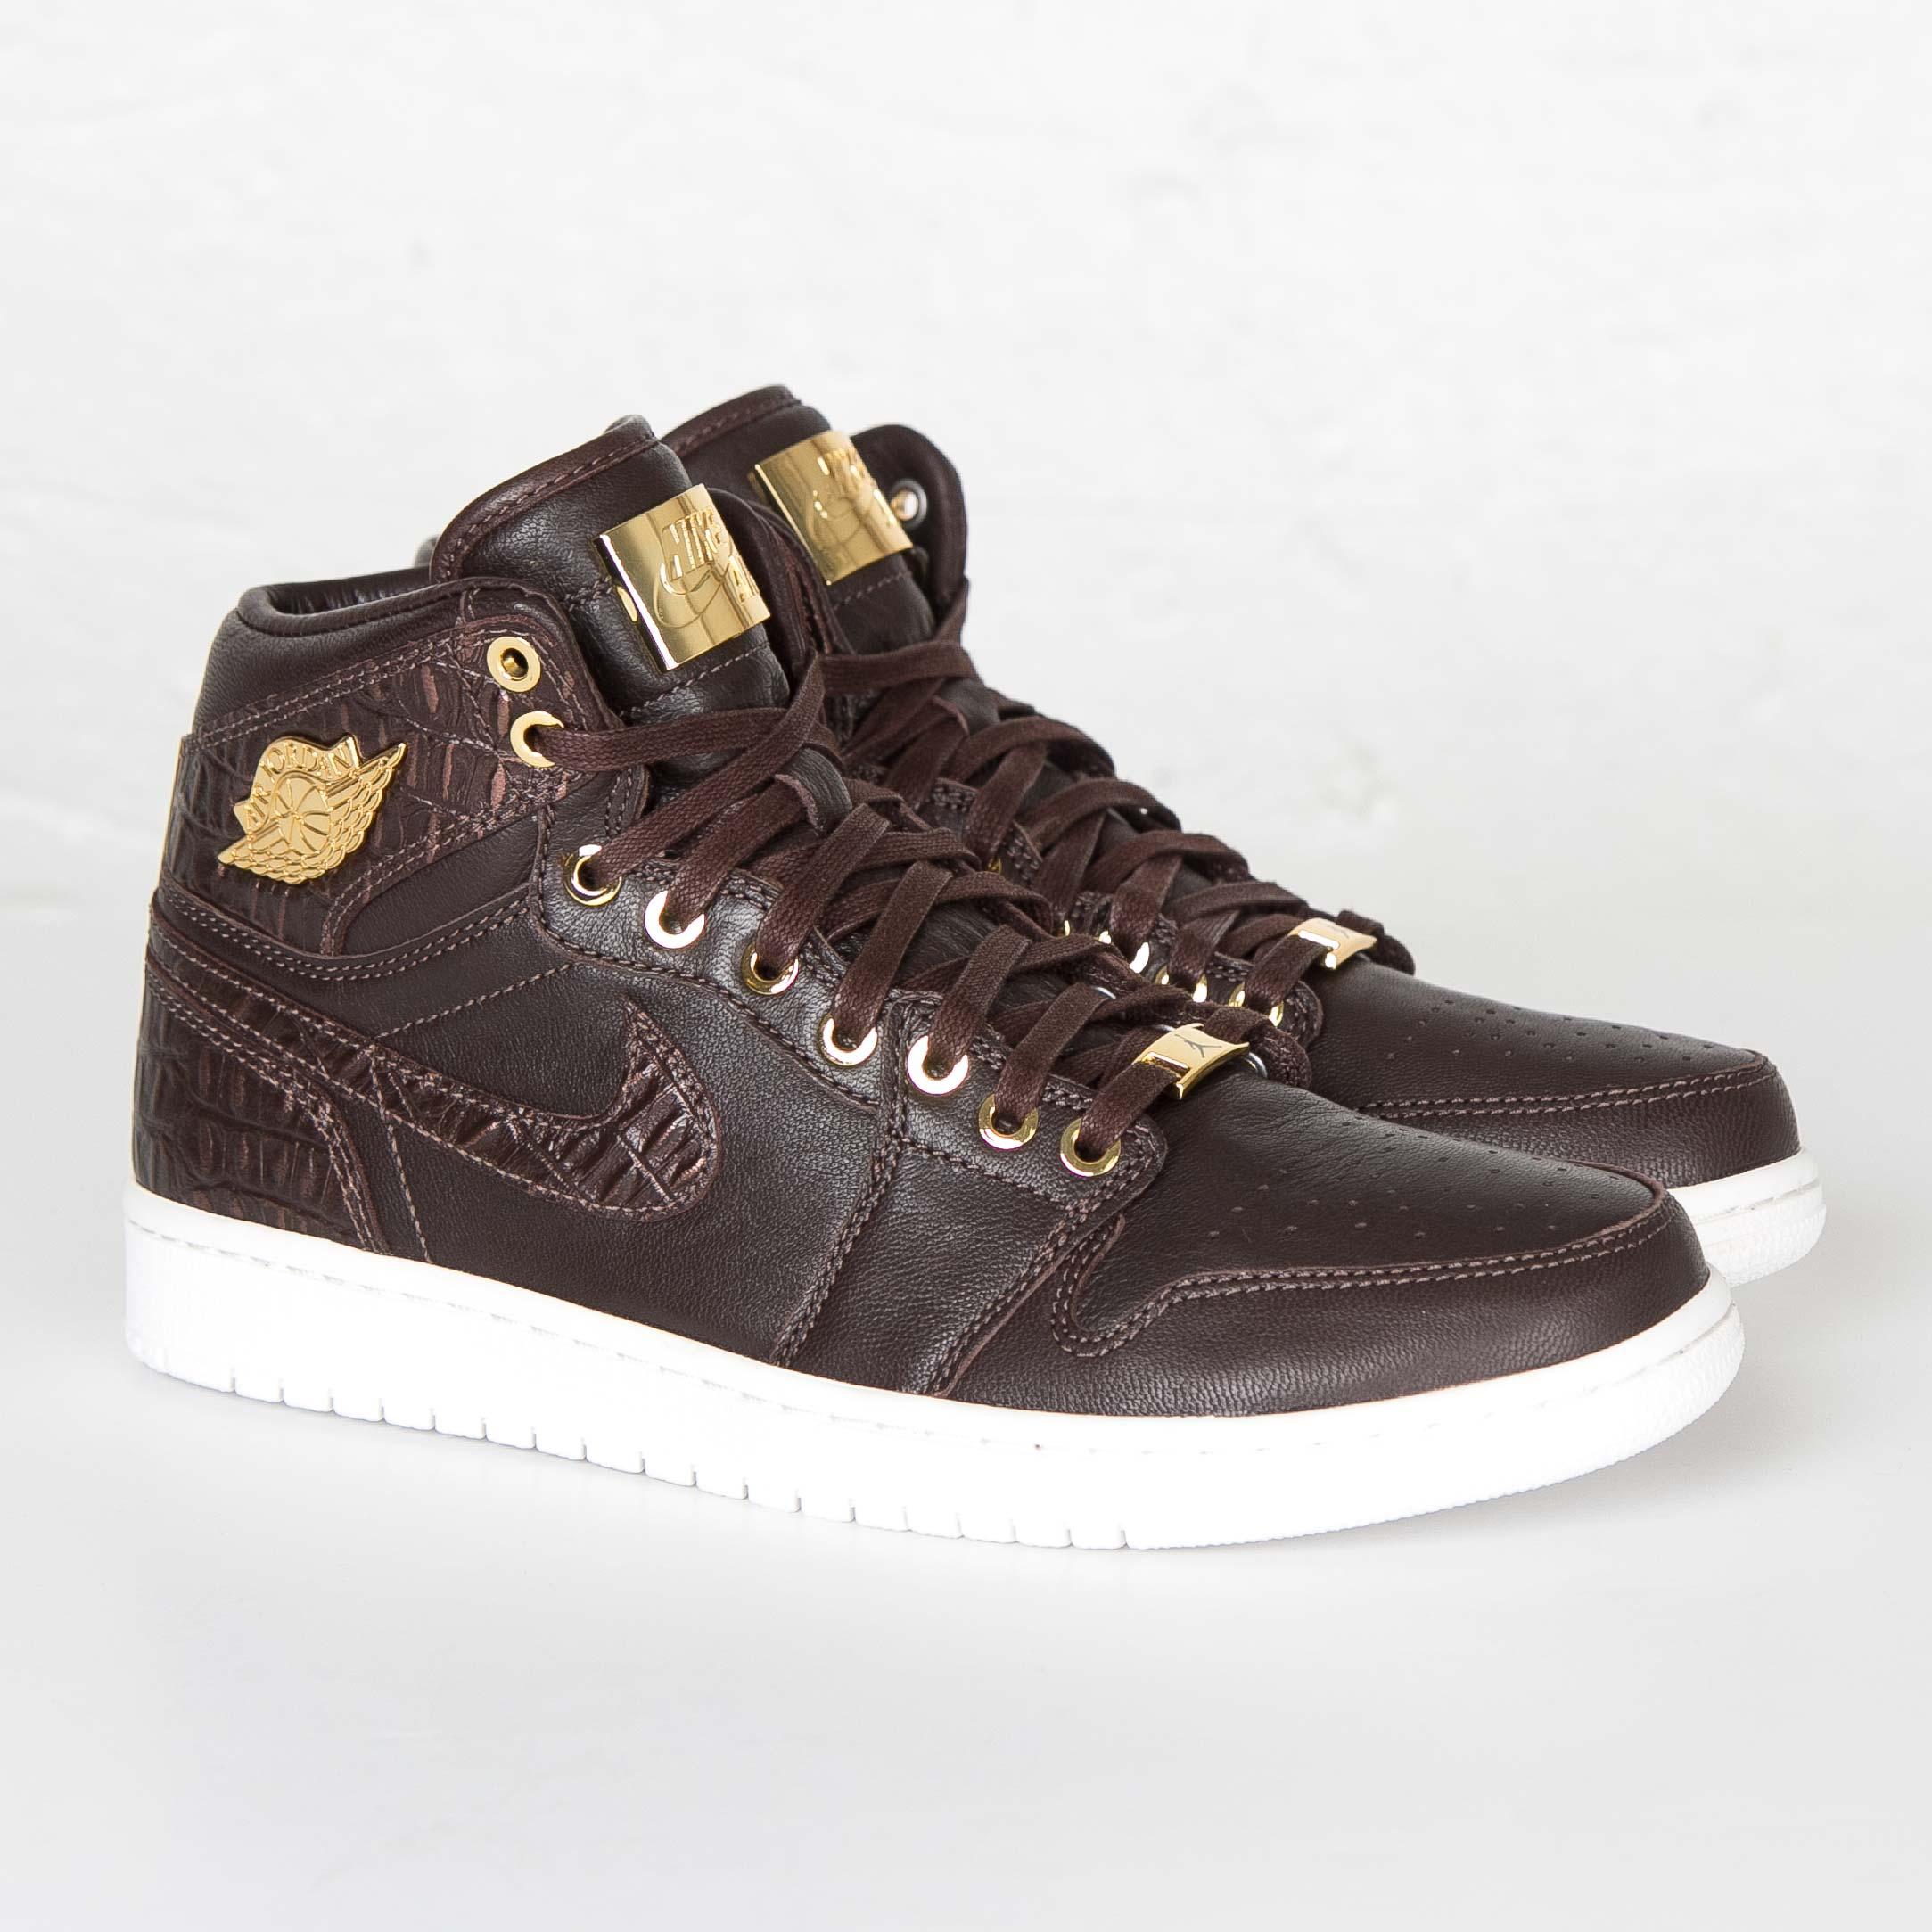 00bed3d572ab Jordan Brand Air Jordan 1 Pinnacle - 705075-205 - Sneakersnstuff ...